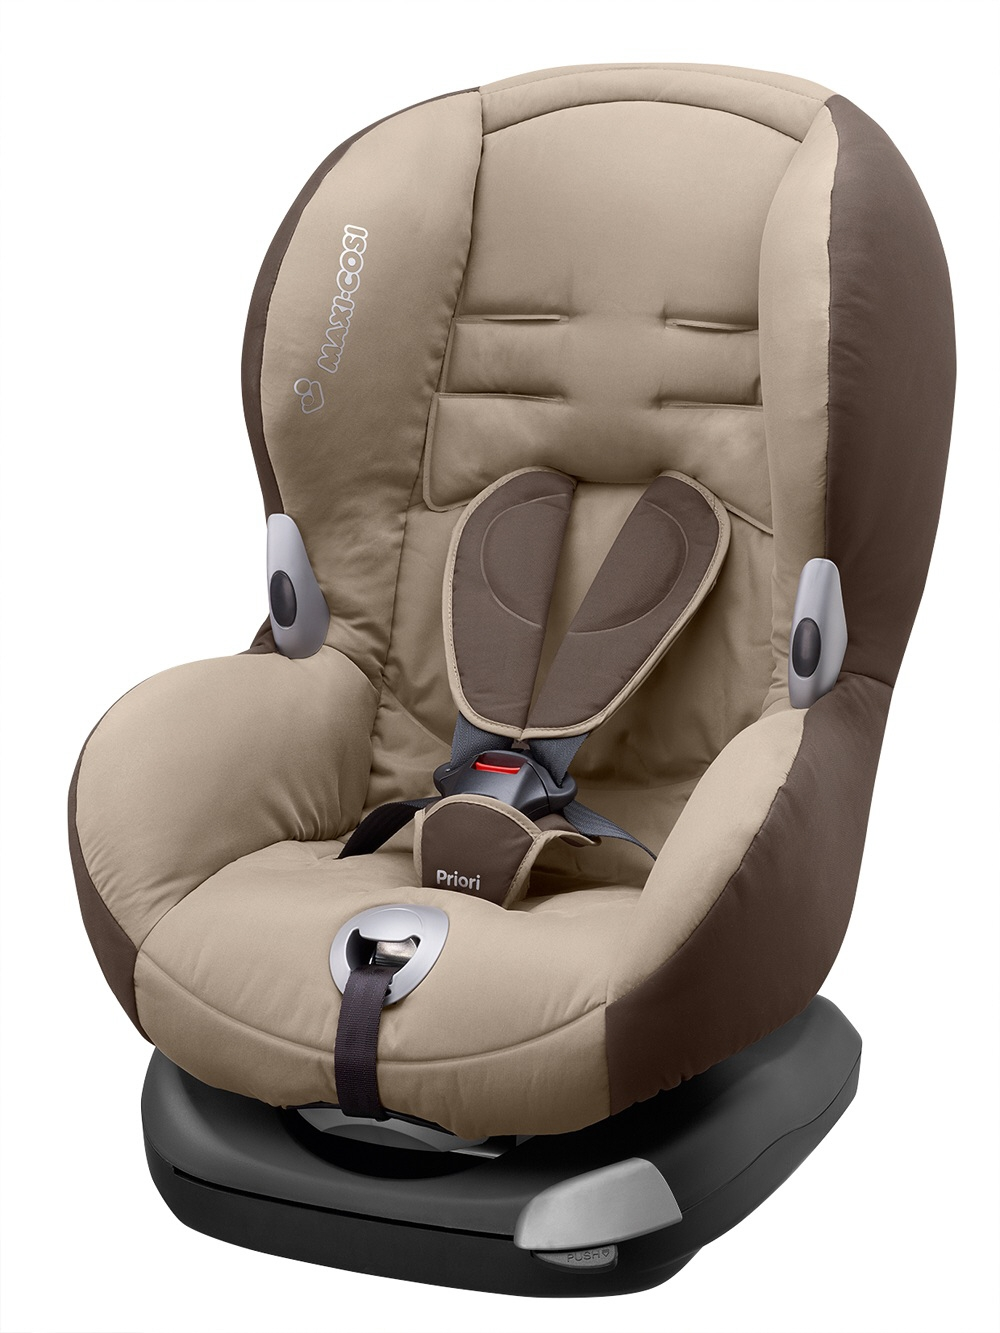 maxi cosi child car seat priori xp buy at kidsroom car seats. Black Bedroom Furniture Sets. Home Design Ideas